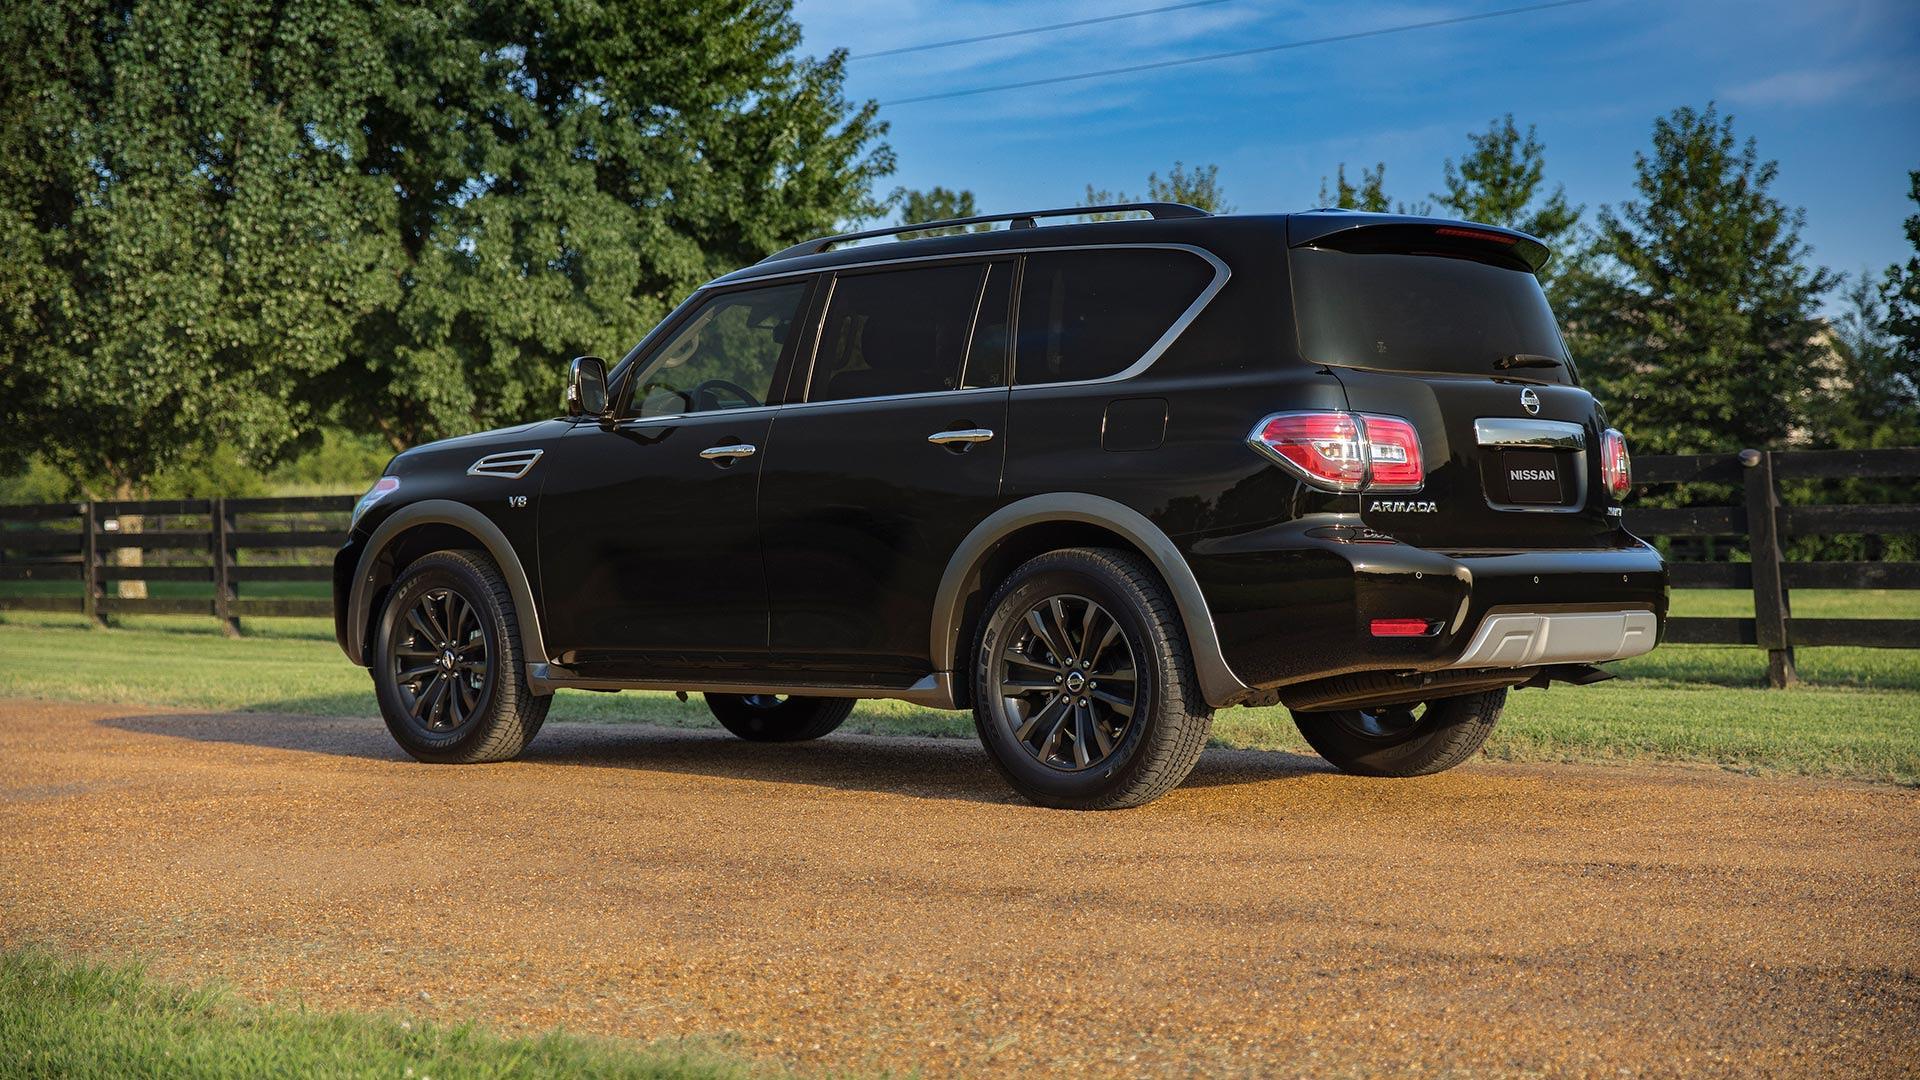 2018 Nissan Patrol (Armada) Y62 announced in the US, added ...